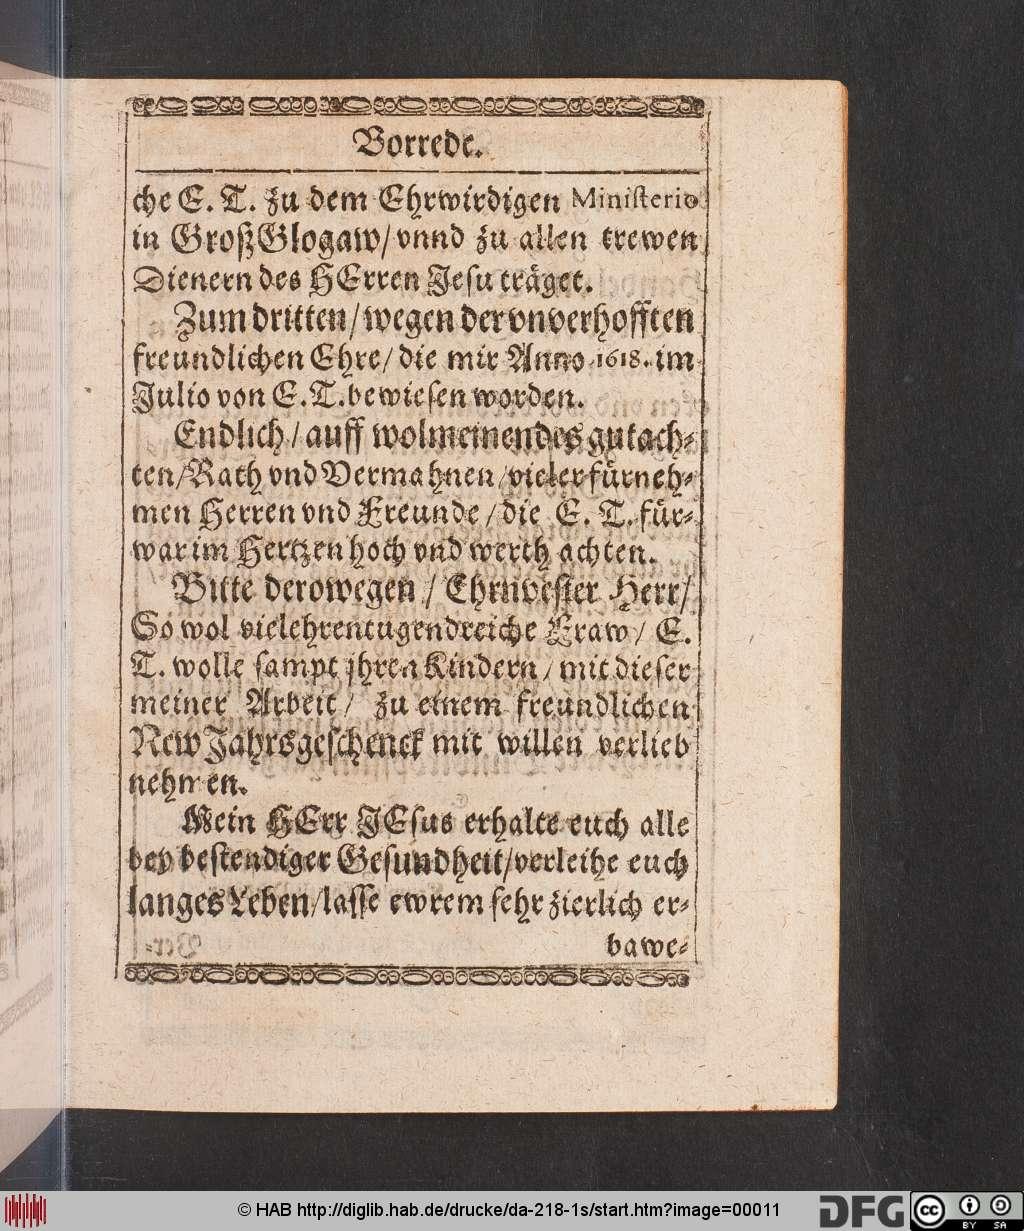 http://diglib.hab.de/drucke/da-218-1s/00011.jpg